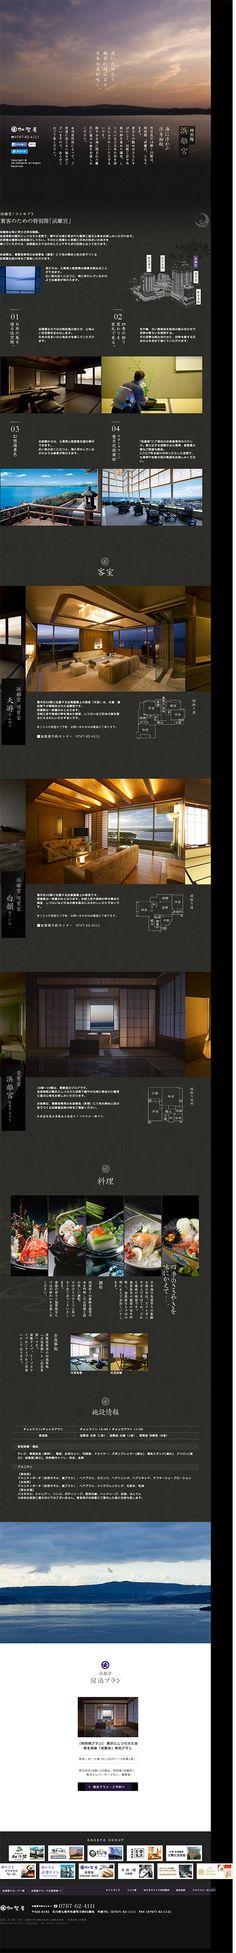 浜離宮 客室 北陸 石川県 和倉温泉 旅館 加賀屋 公式ホームページ